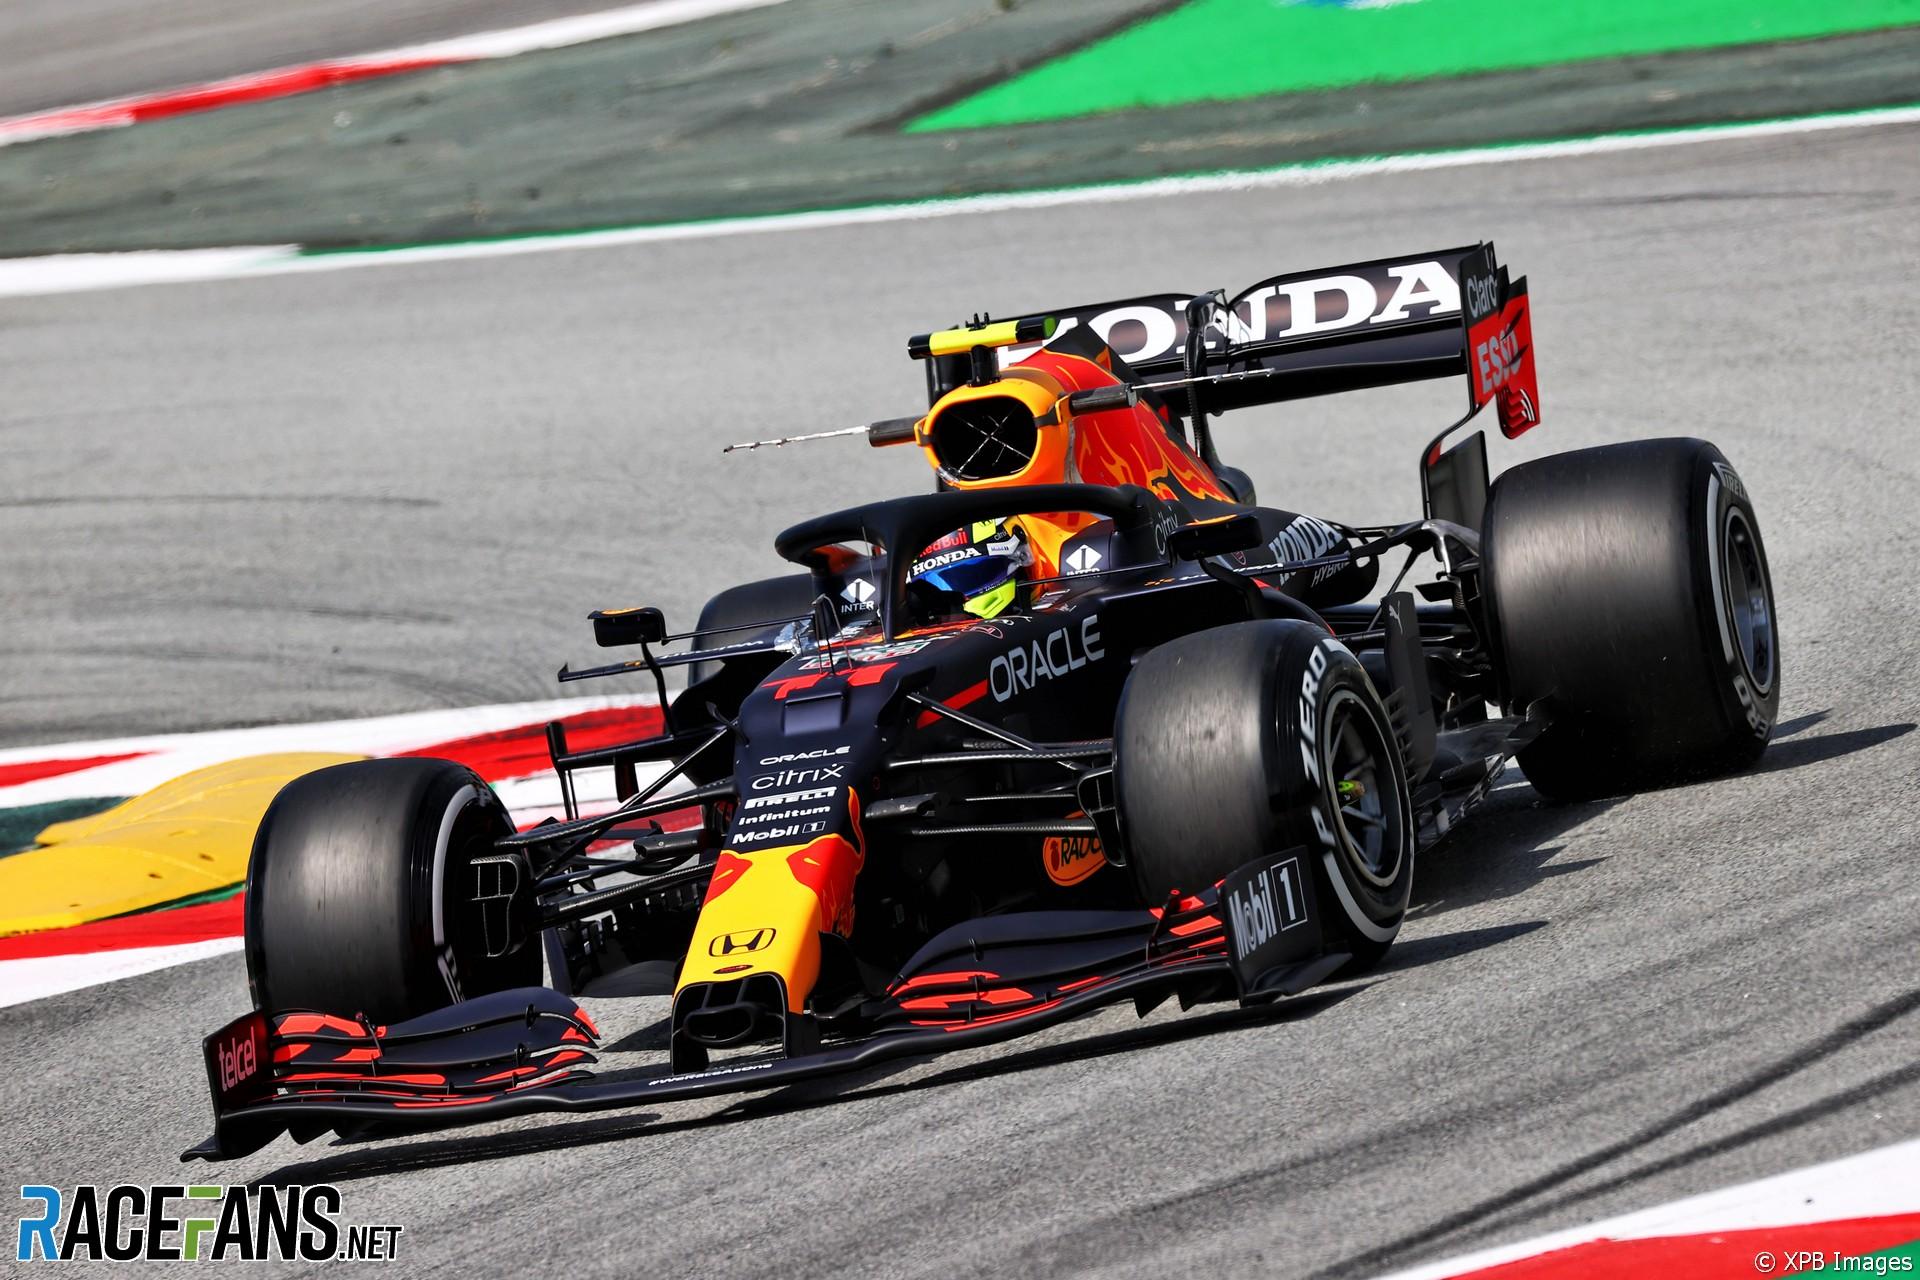 Sergio Perez, Red Bull, Circuit de Catalunya, 2021